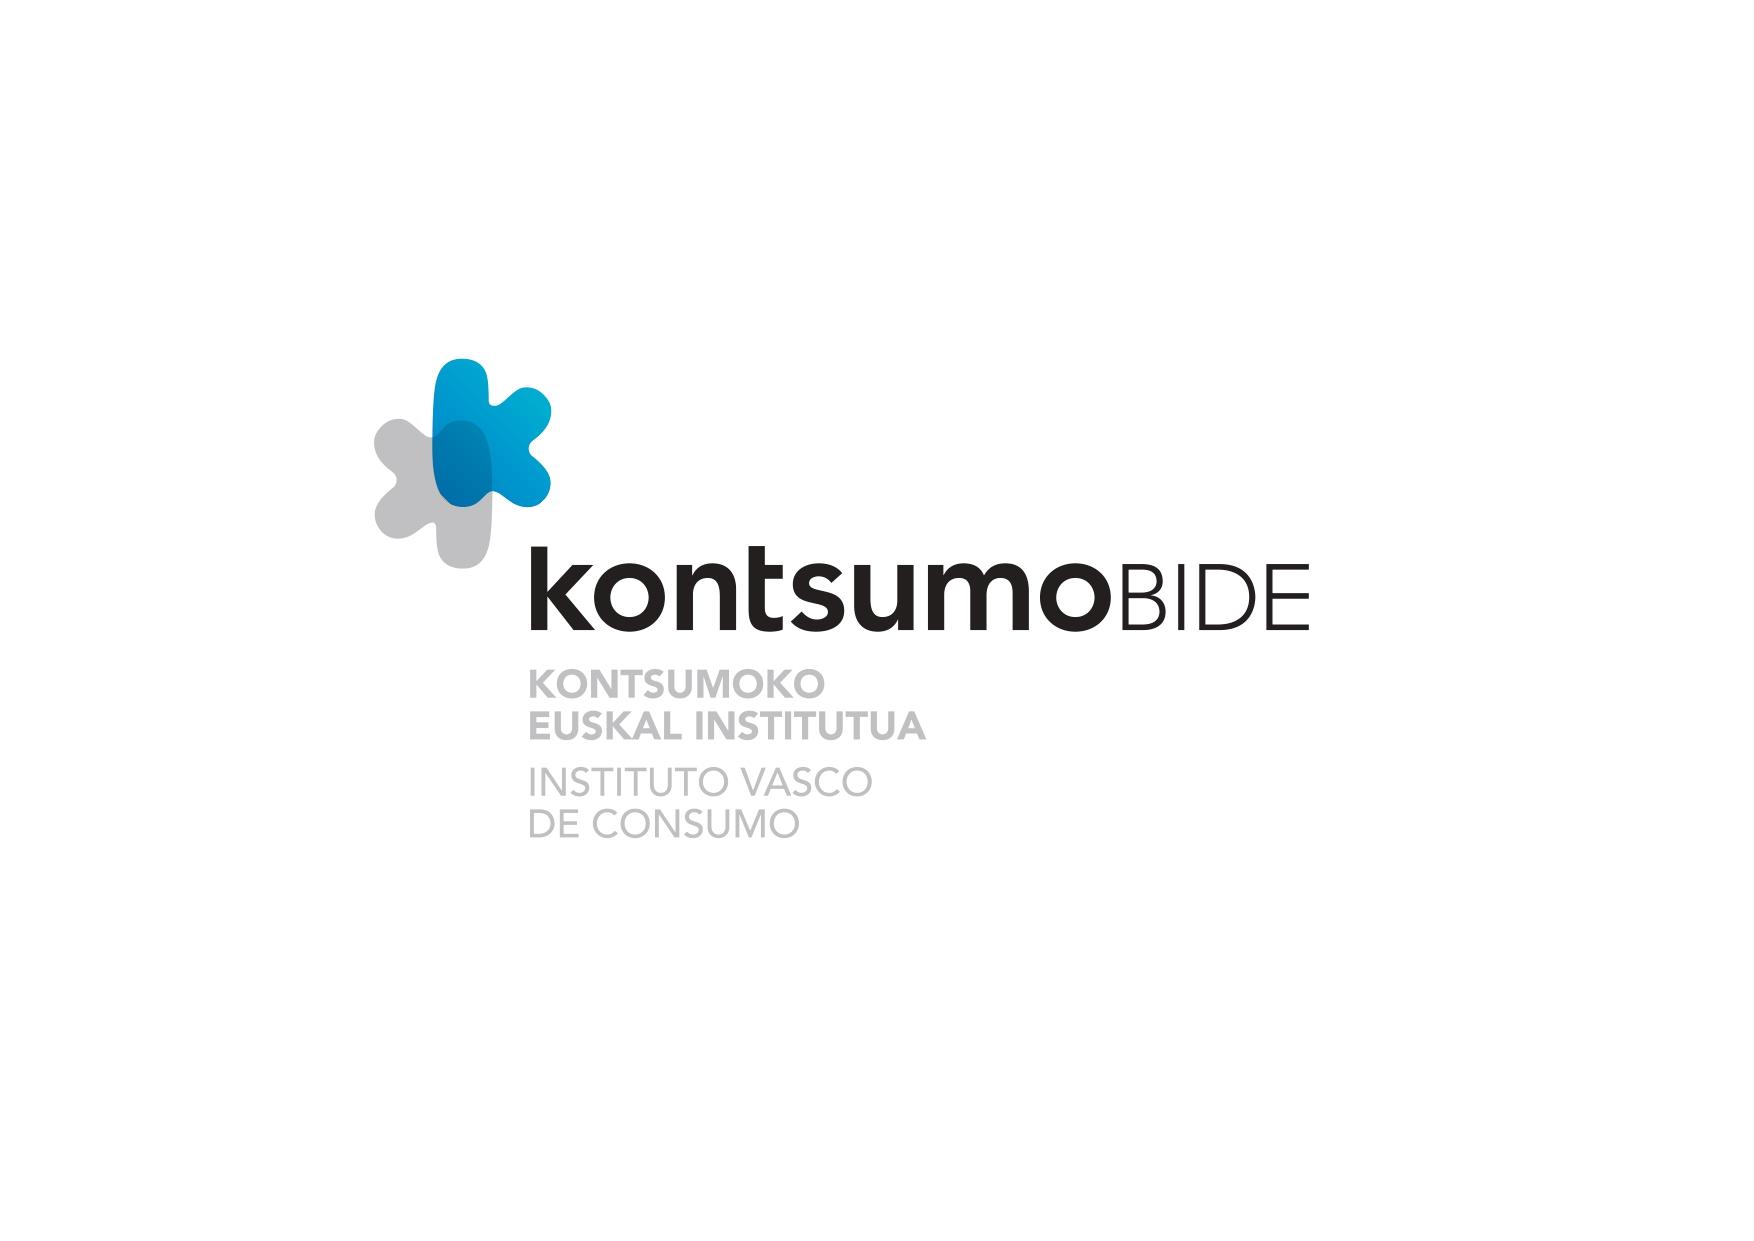 KontsumoBIDE_pos-color_page-0001.jpg